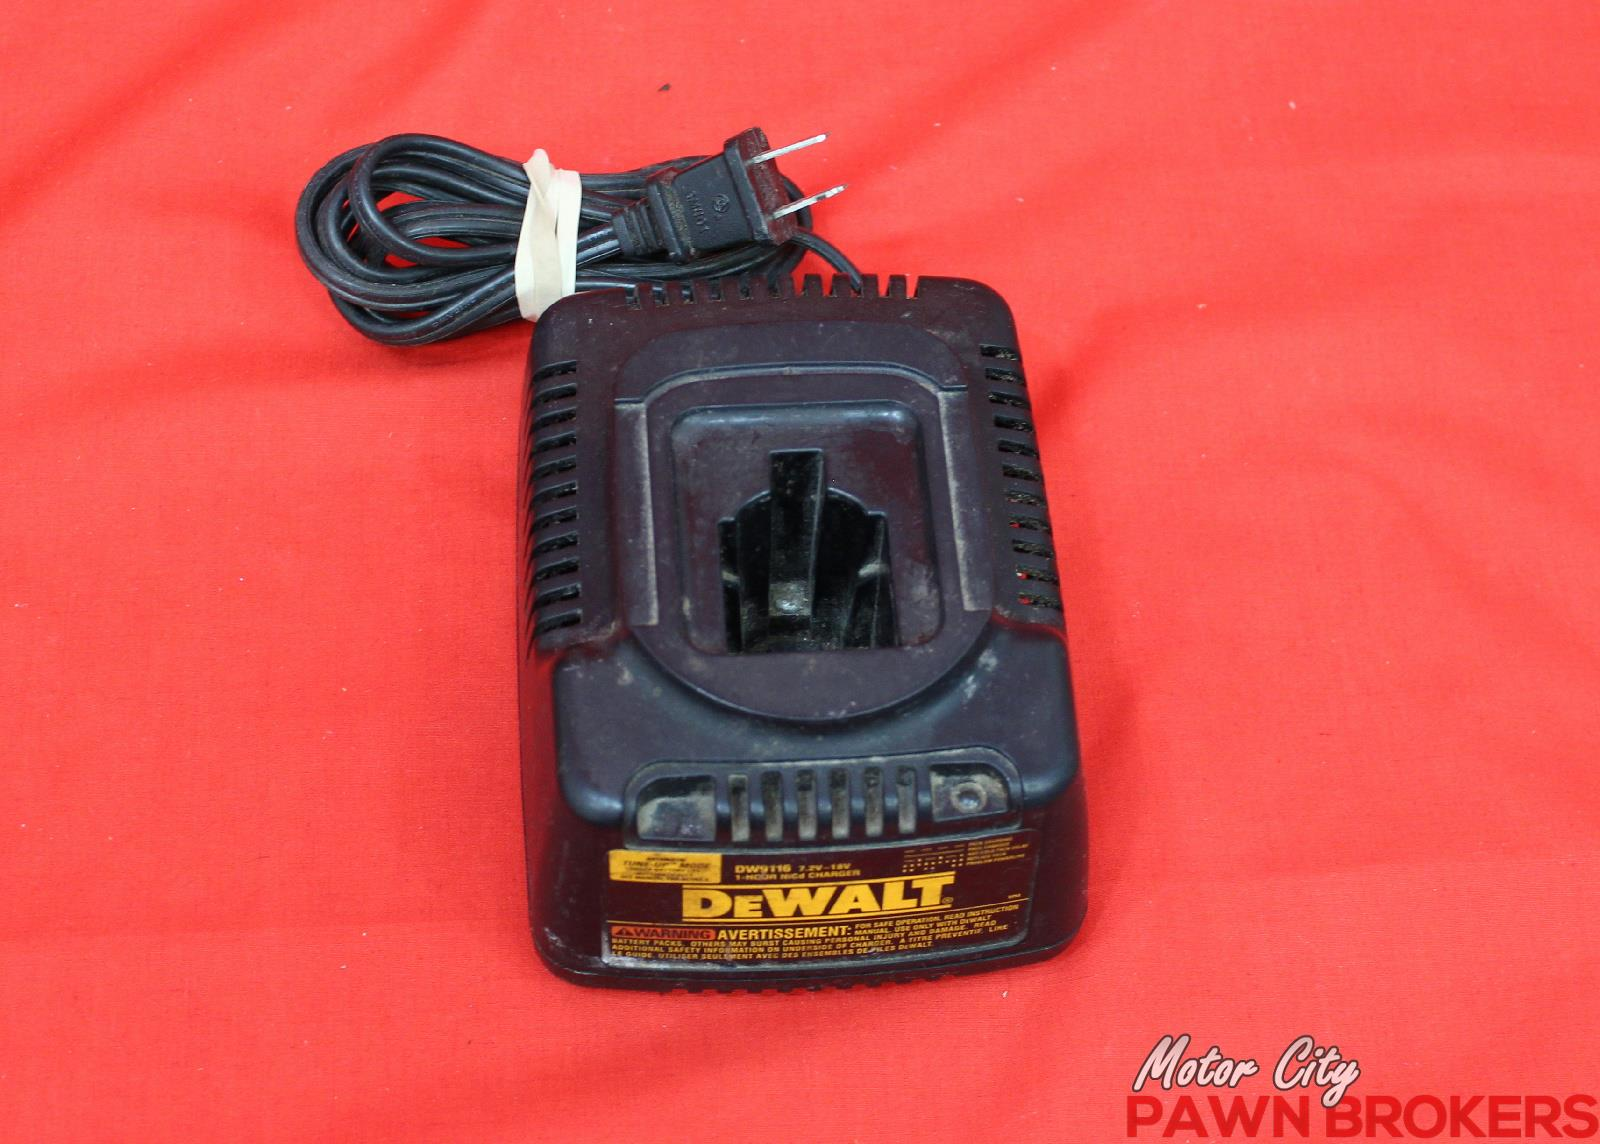 Dewalt xrp dw989 18v 1 2 chuck power tool cordless for Motor city pawn shop